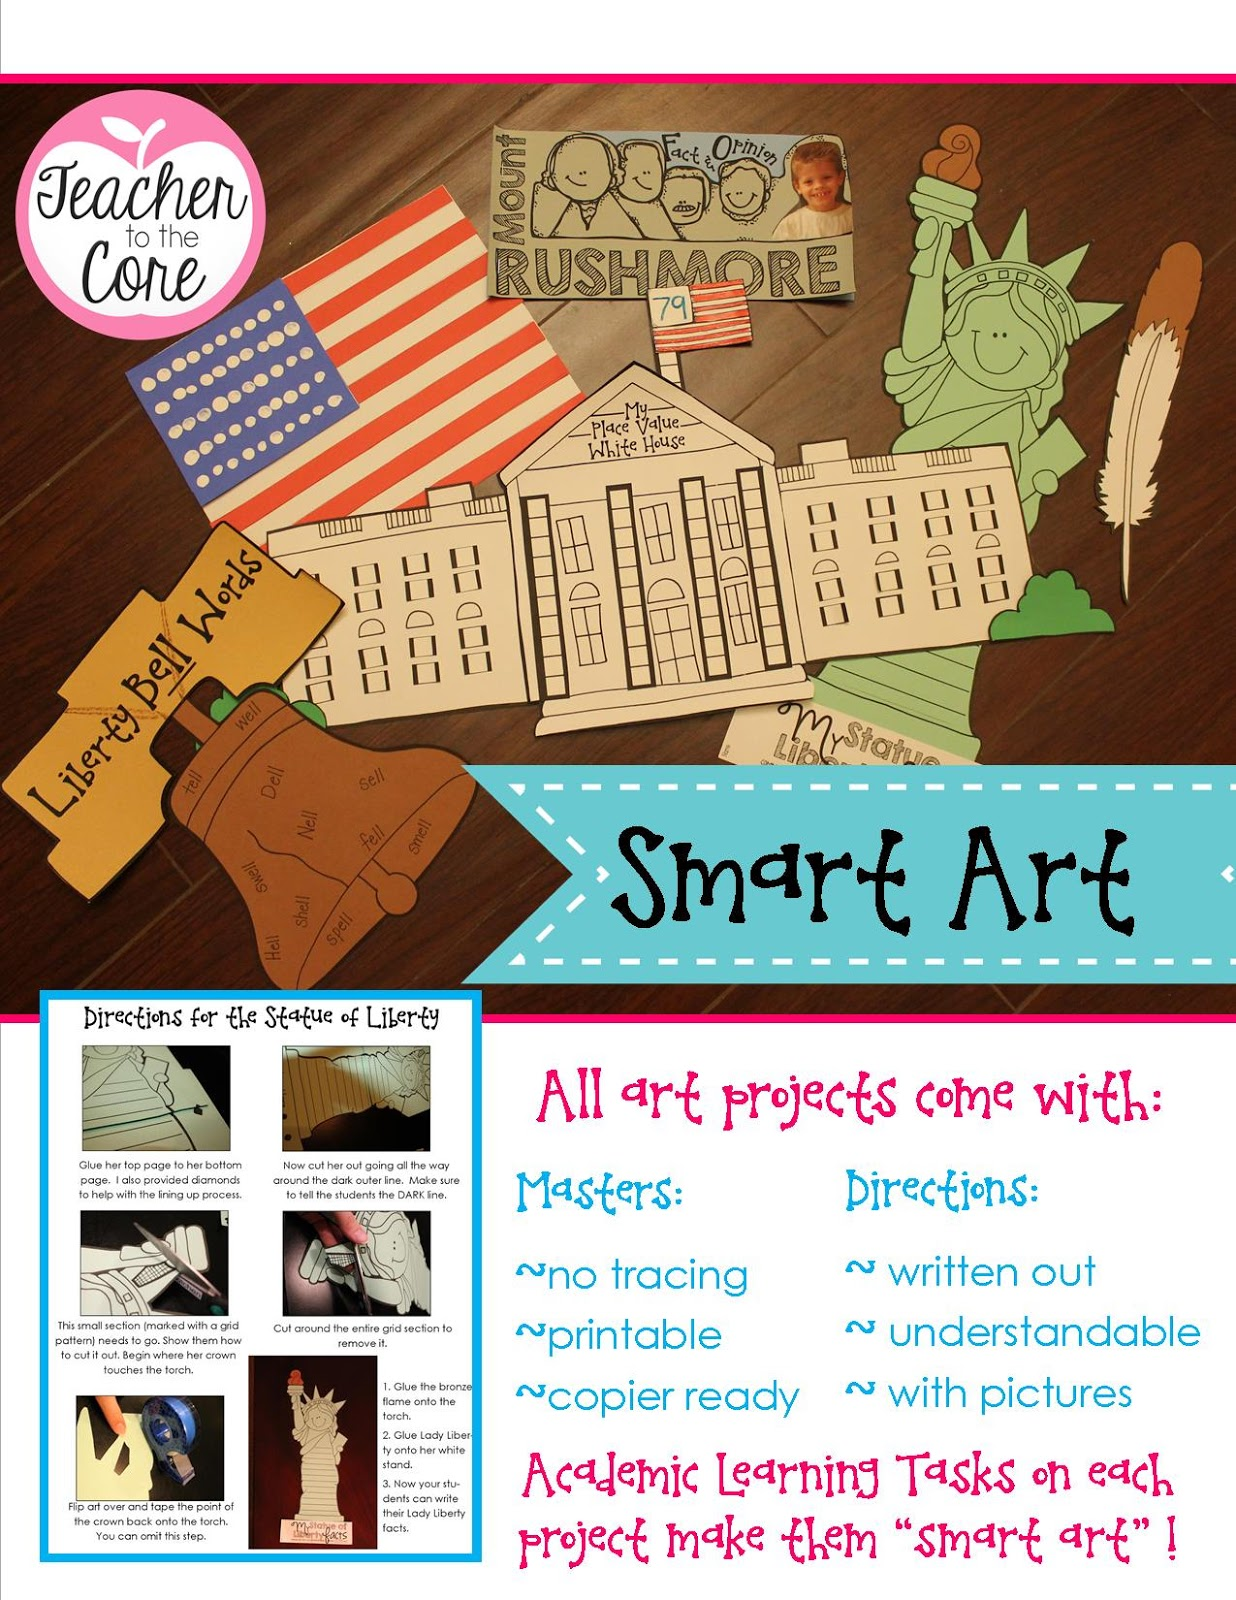 American Symbols Teacher To The Core